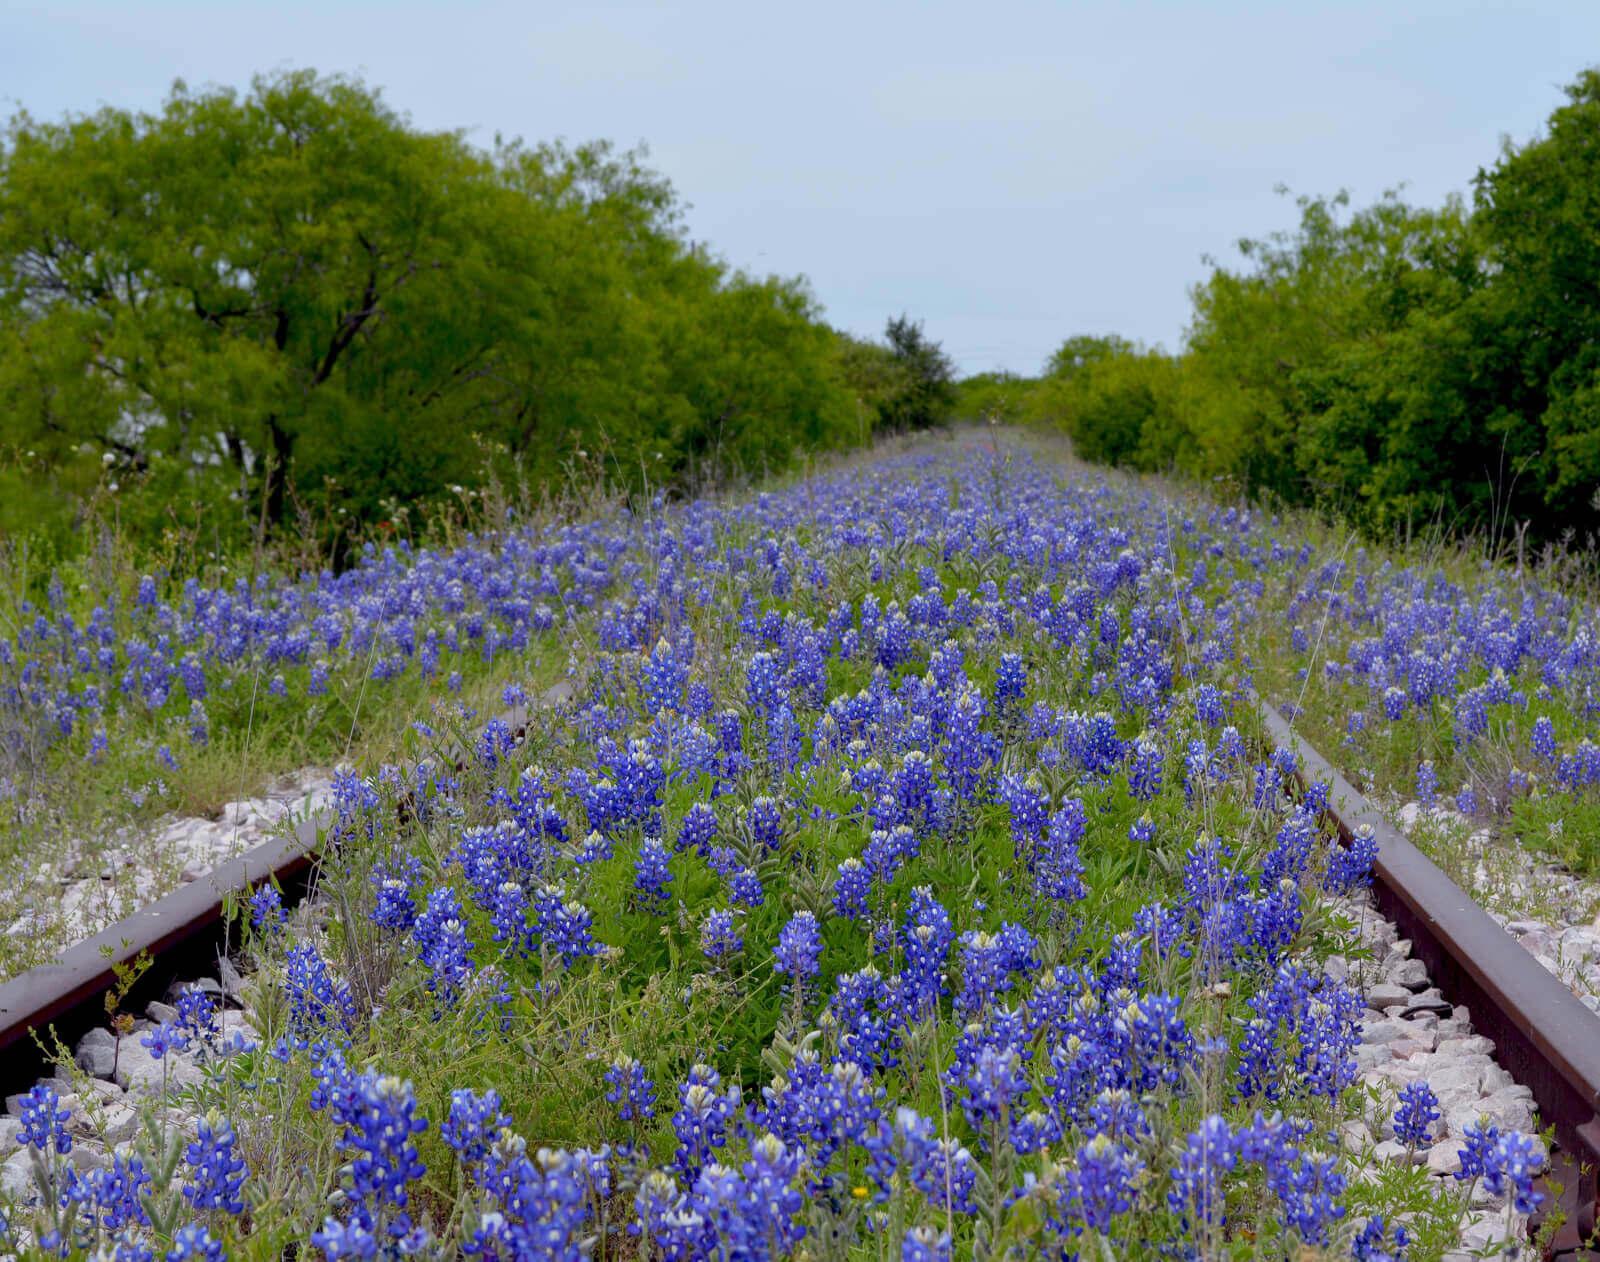 Find Drug and Alcohol Rehab in Texarkana, Texas